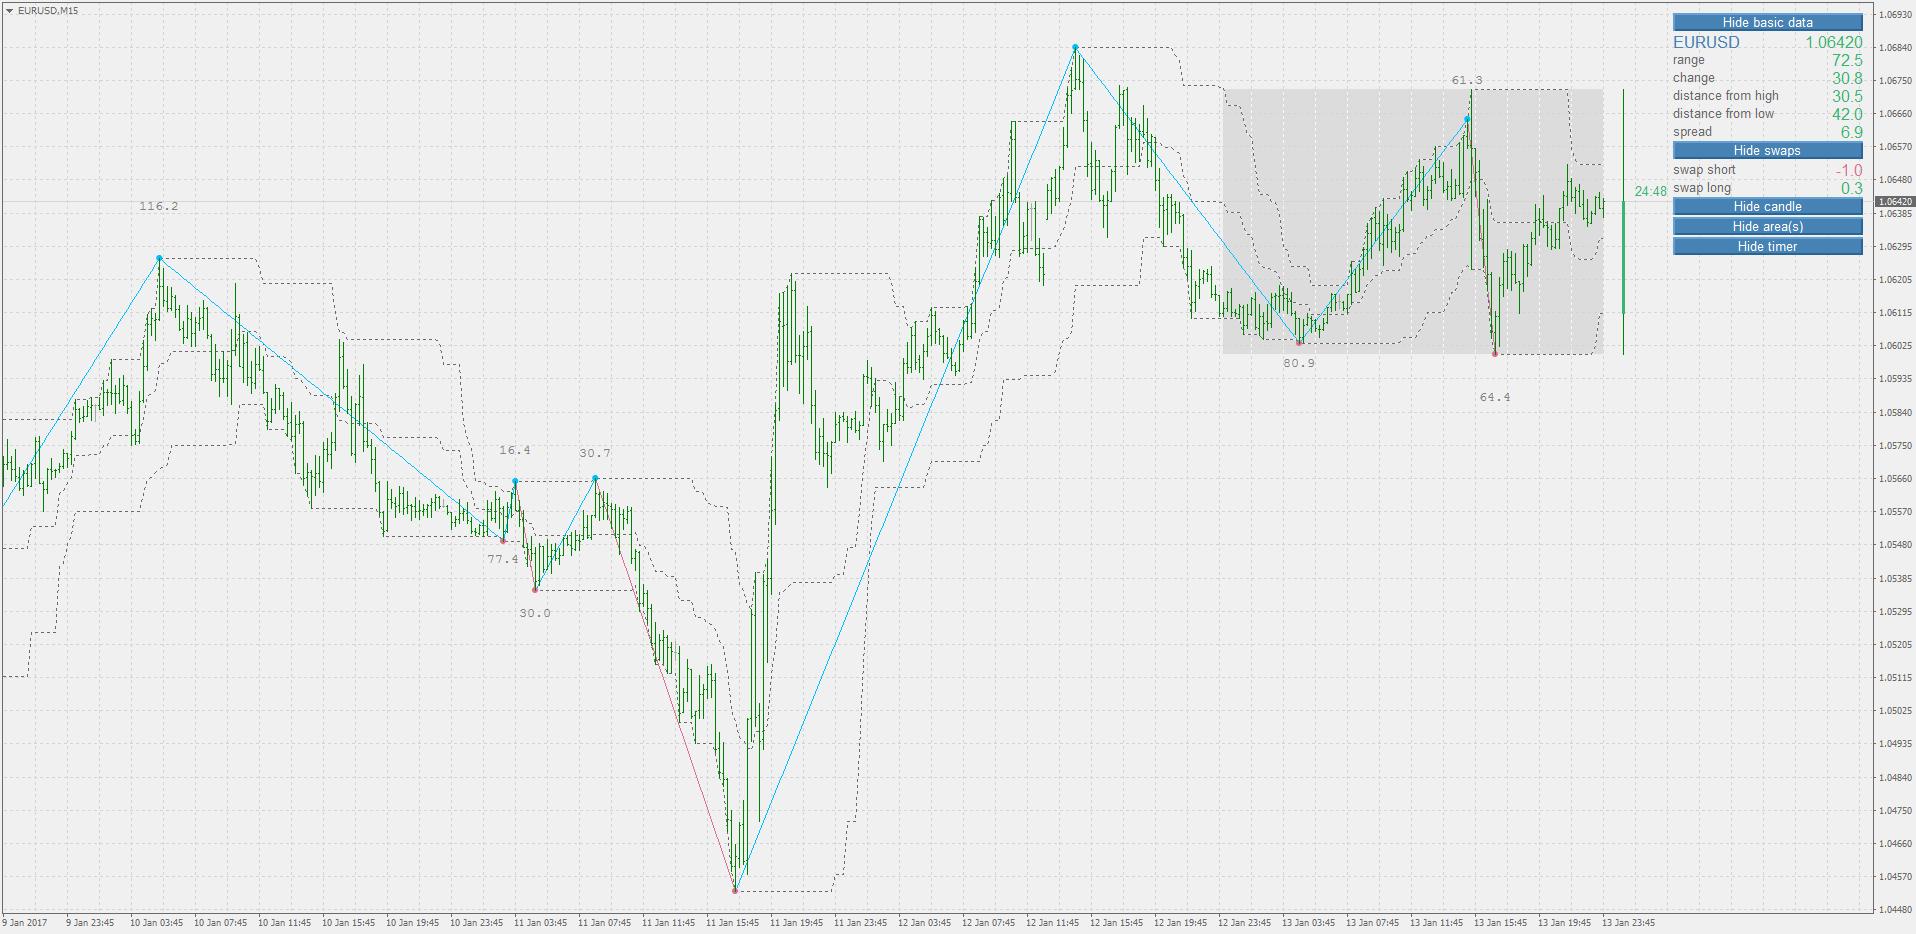 Forex tsd elite indicators free download